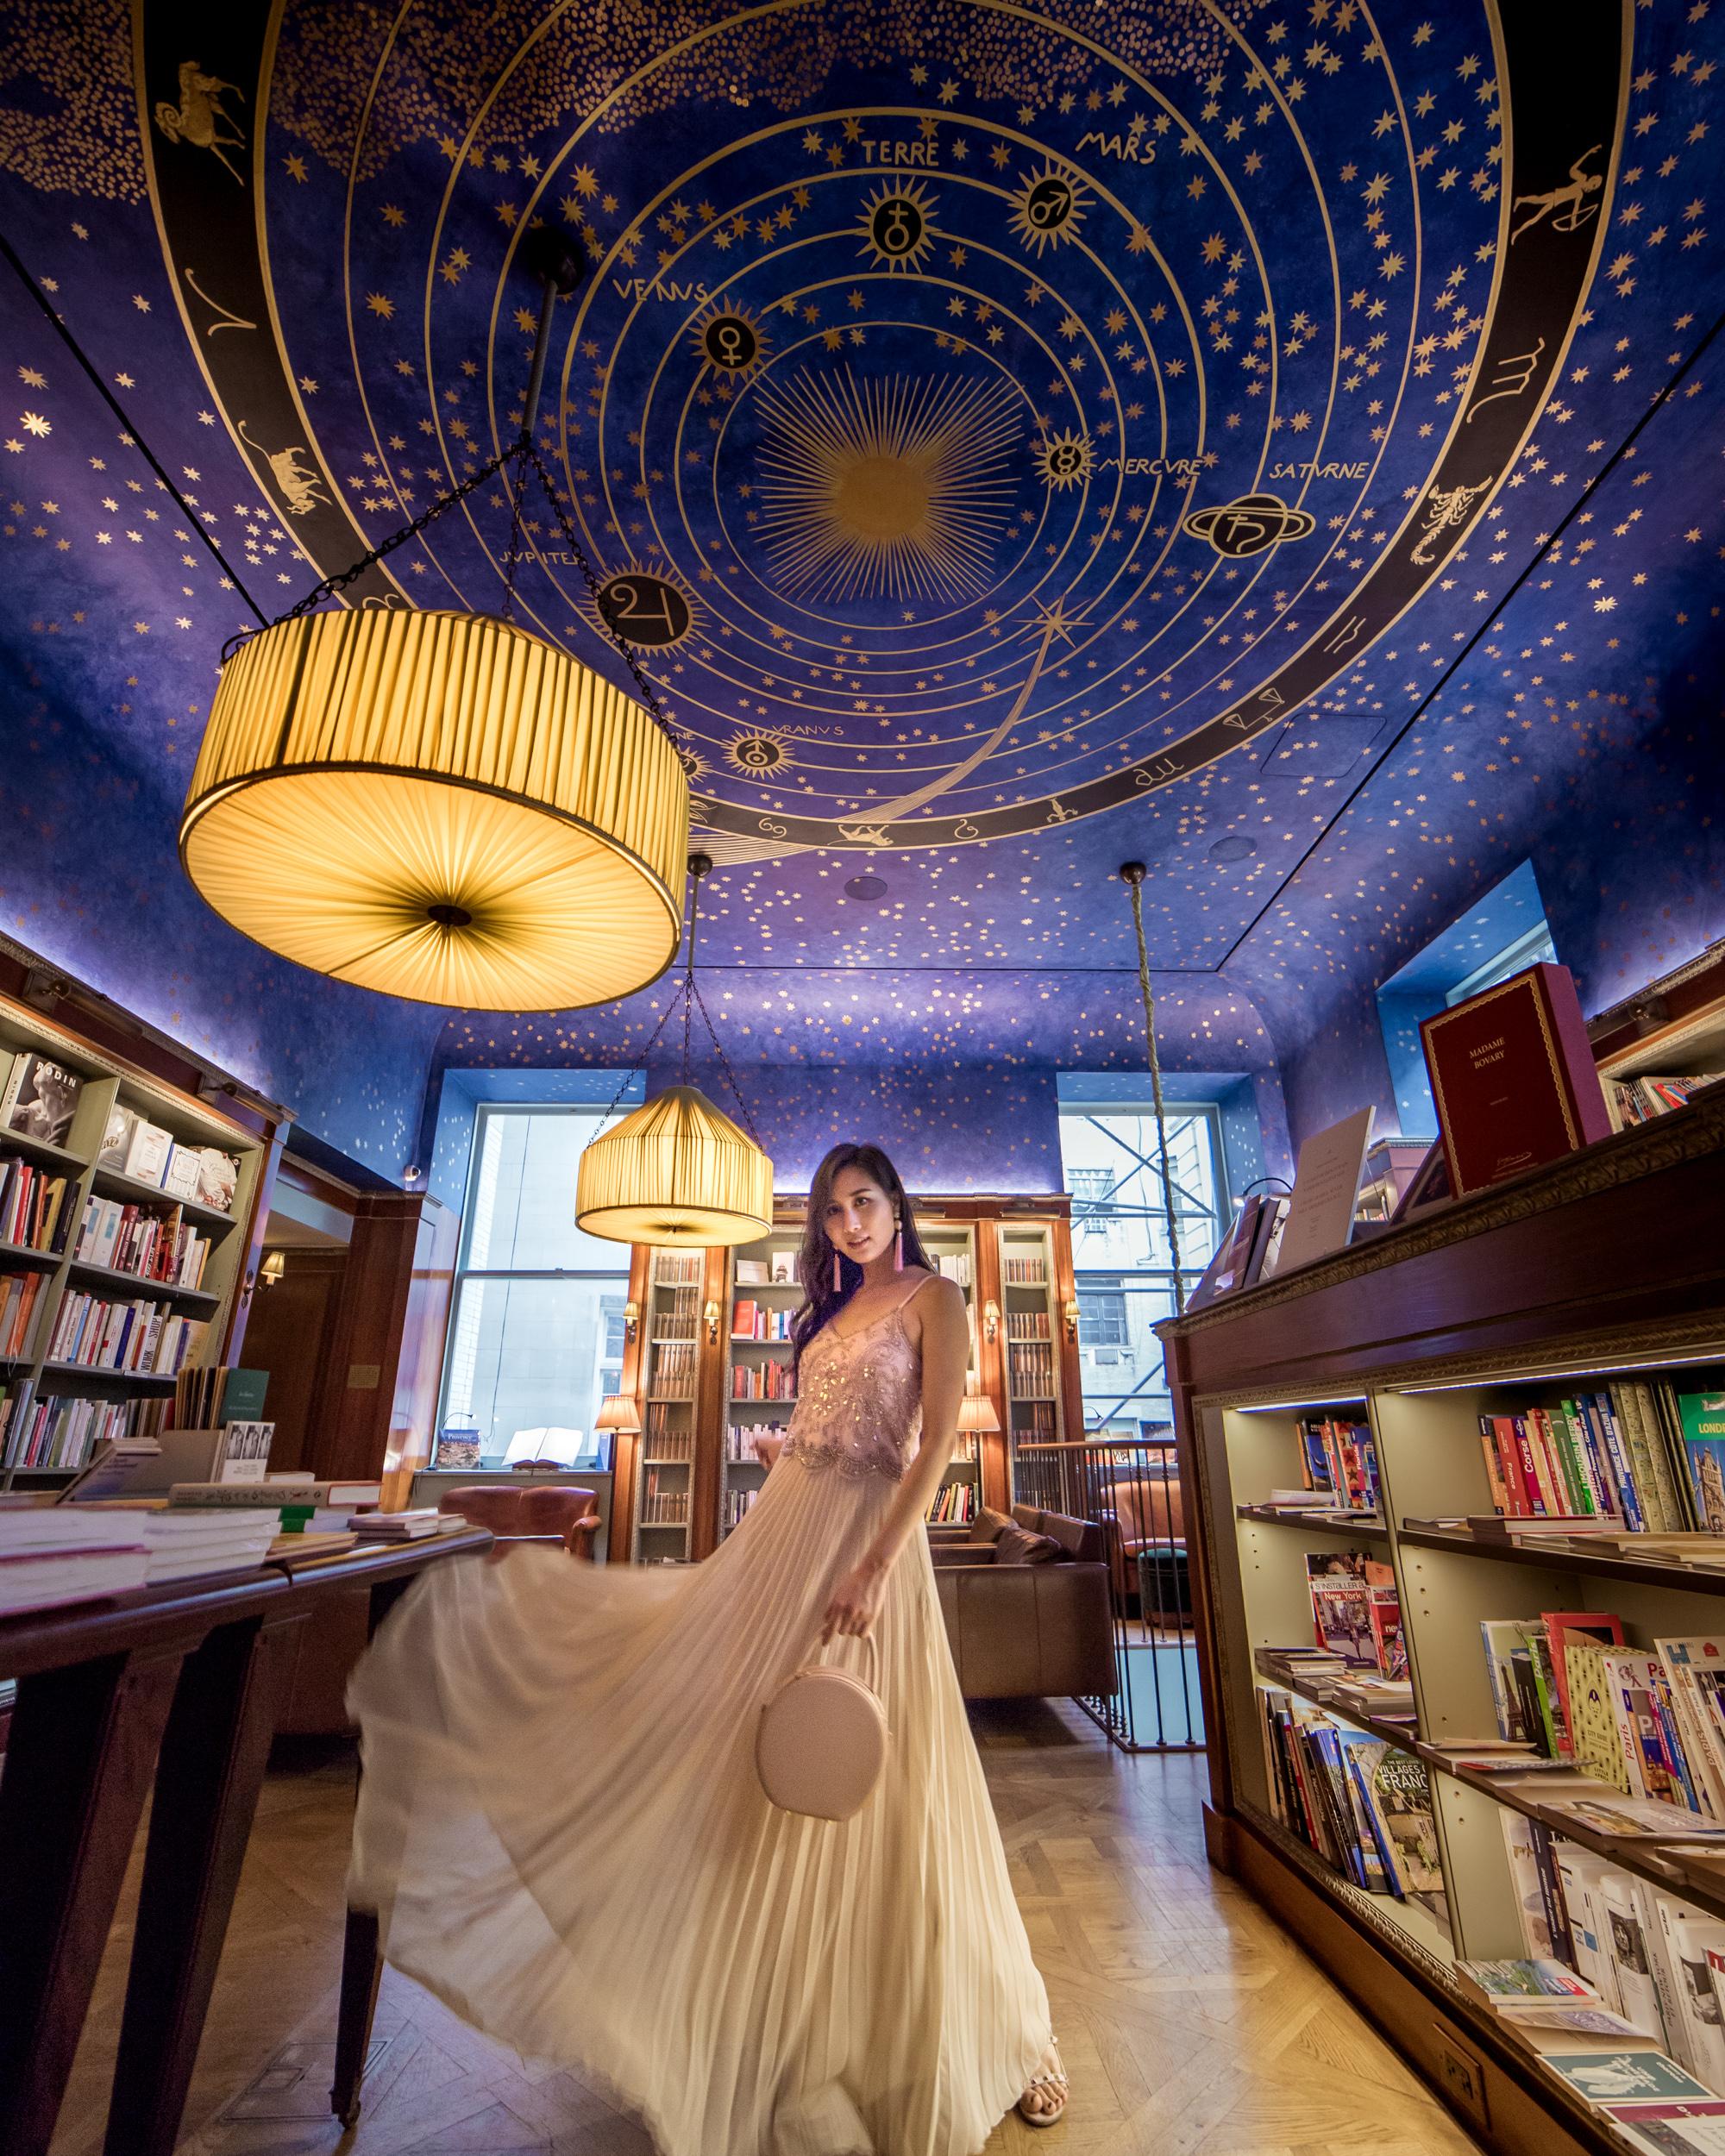 Albertine Book store. Photo by Tina from  @ofleatherandlace